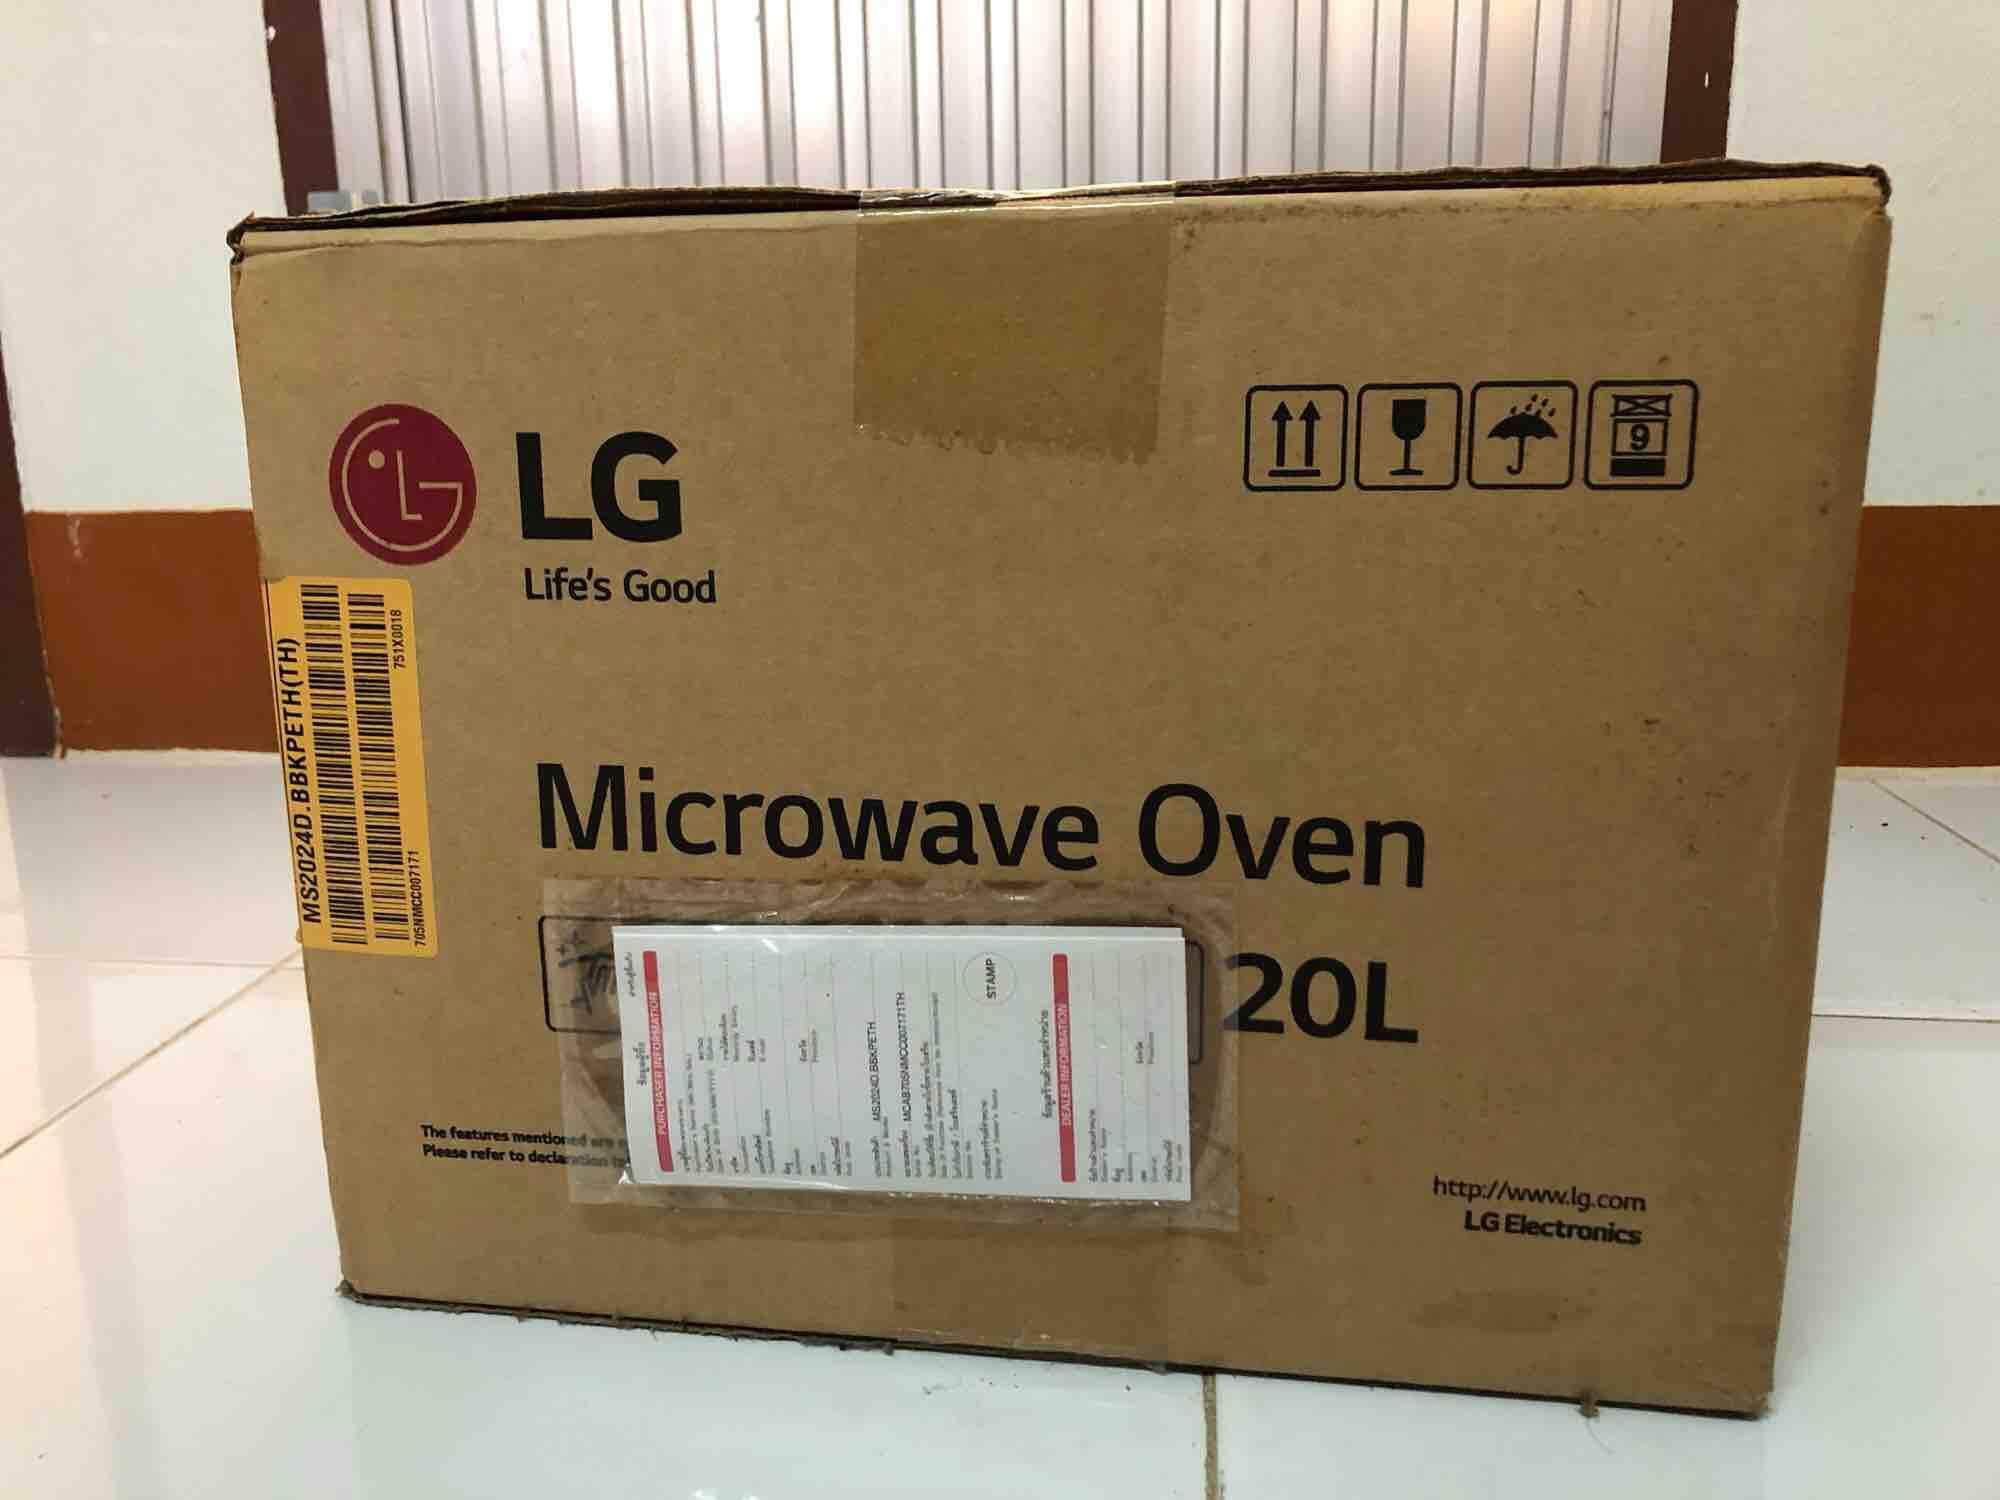 Microwave อุ่นอาหาร ยี่ห้อ LG รุ่น MS2024D